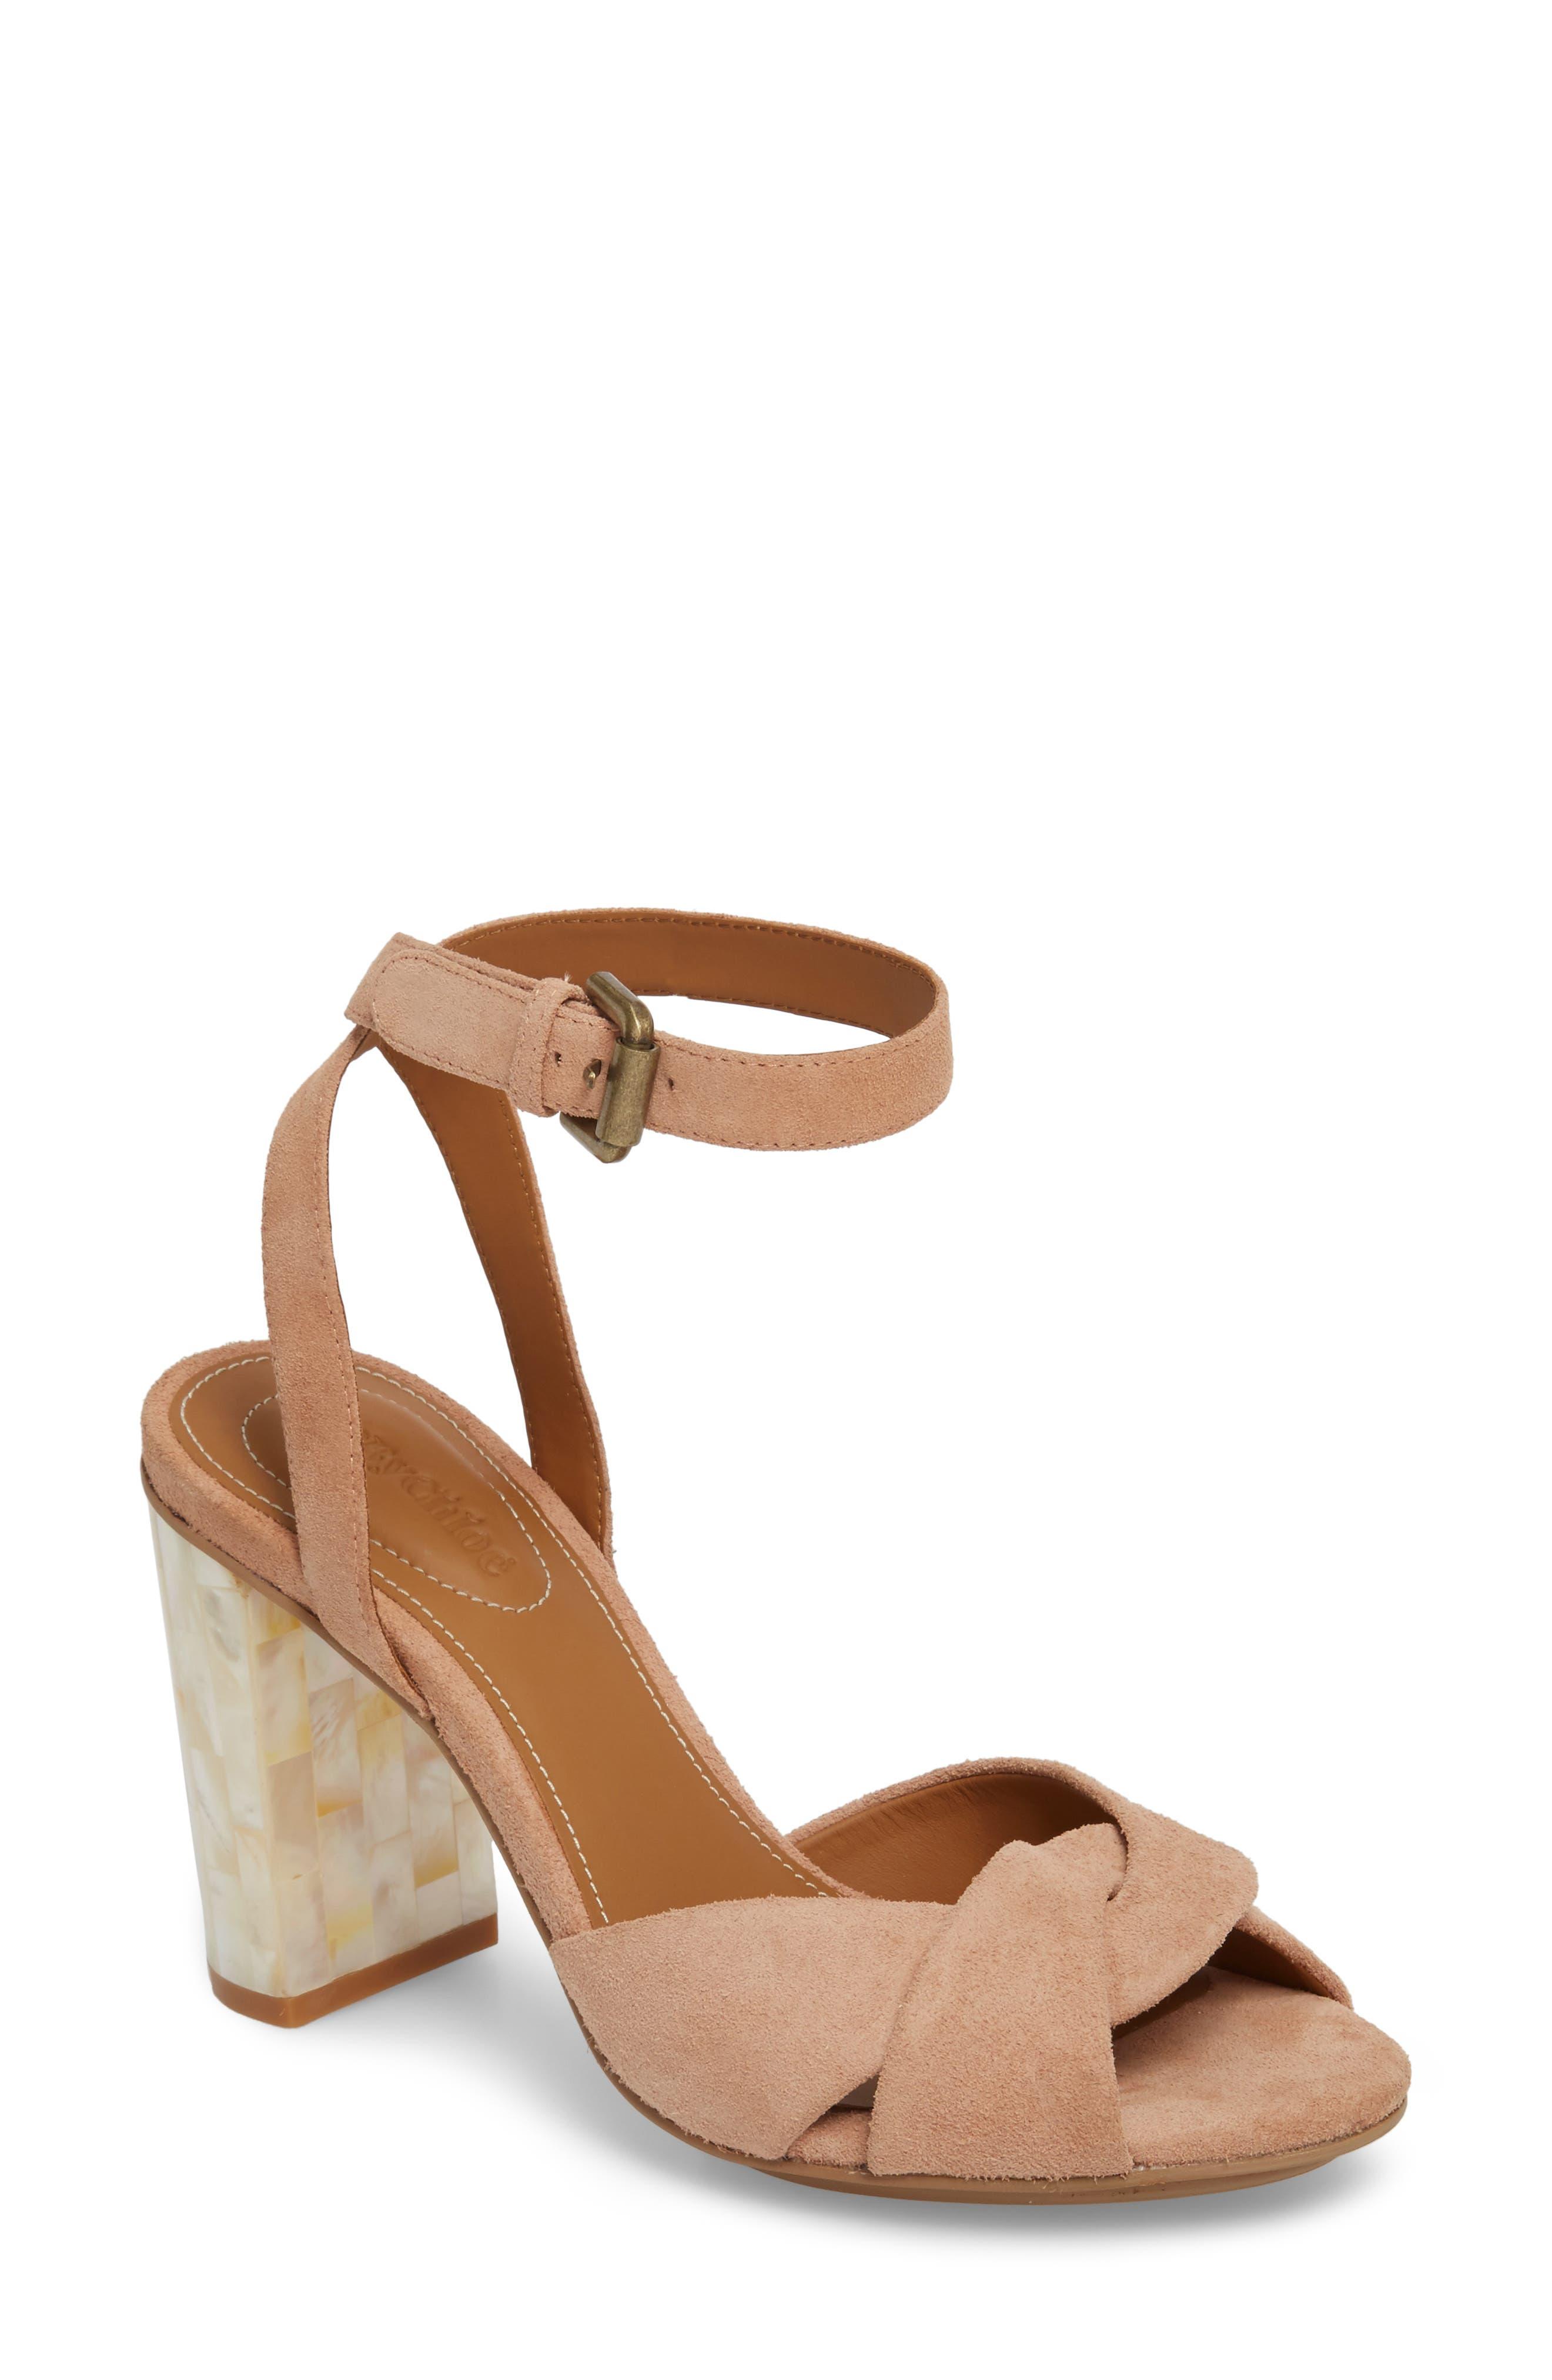 Isida Block Heel Sandal,                             Main thumbnail 1, color,                             Cipria